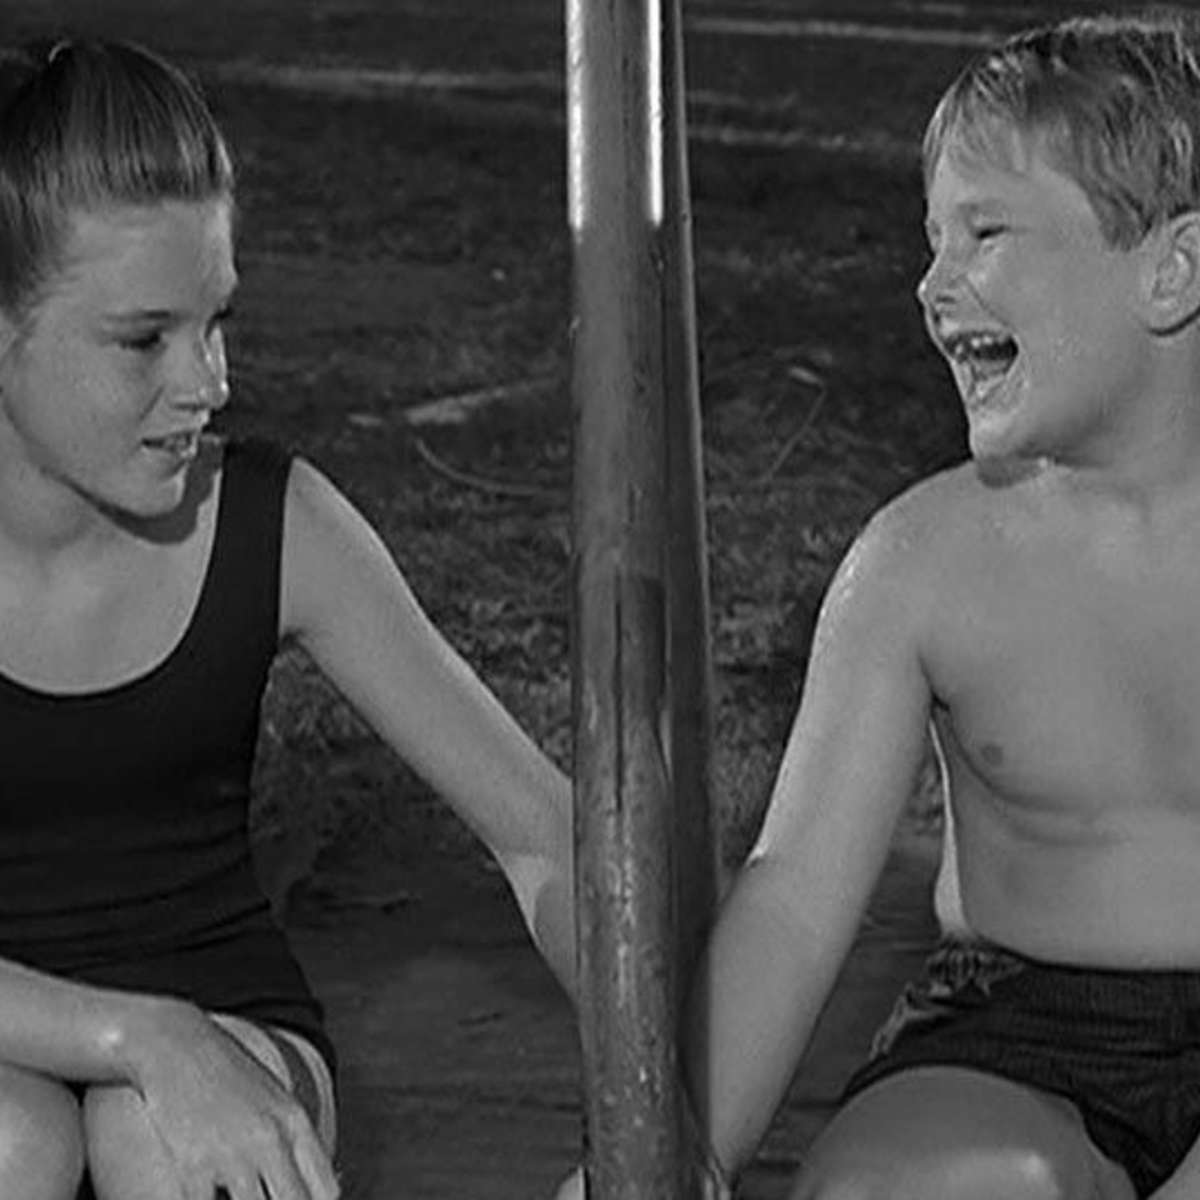 Twilight Zone The Bewitchin' Pool hero